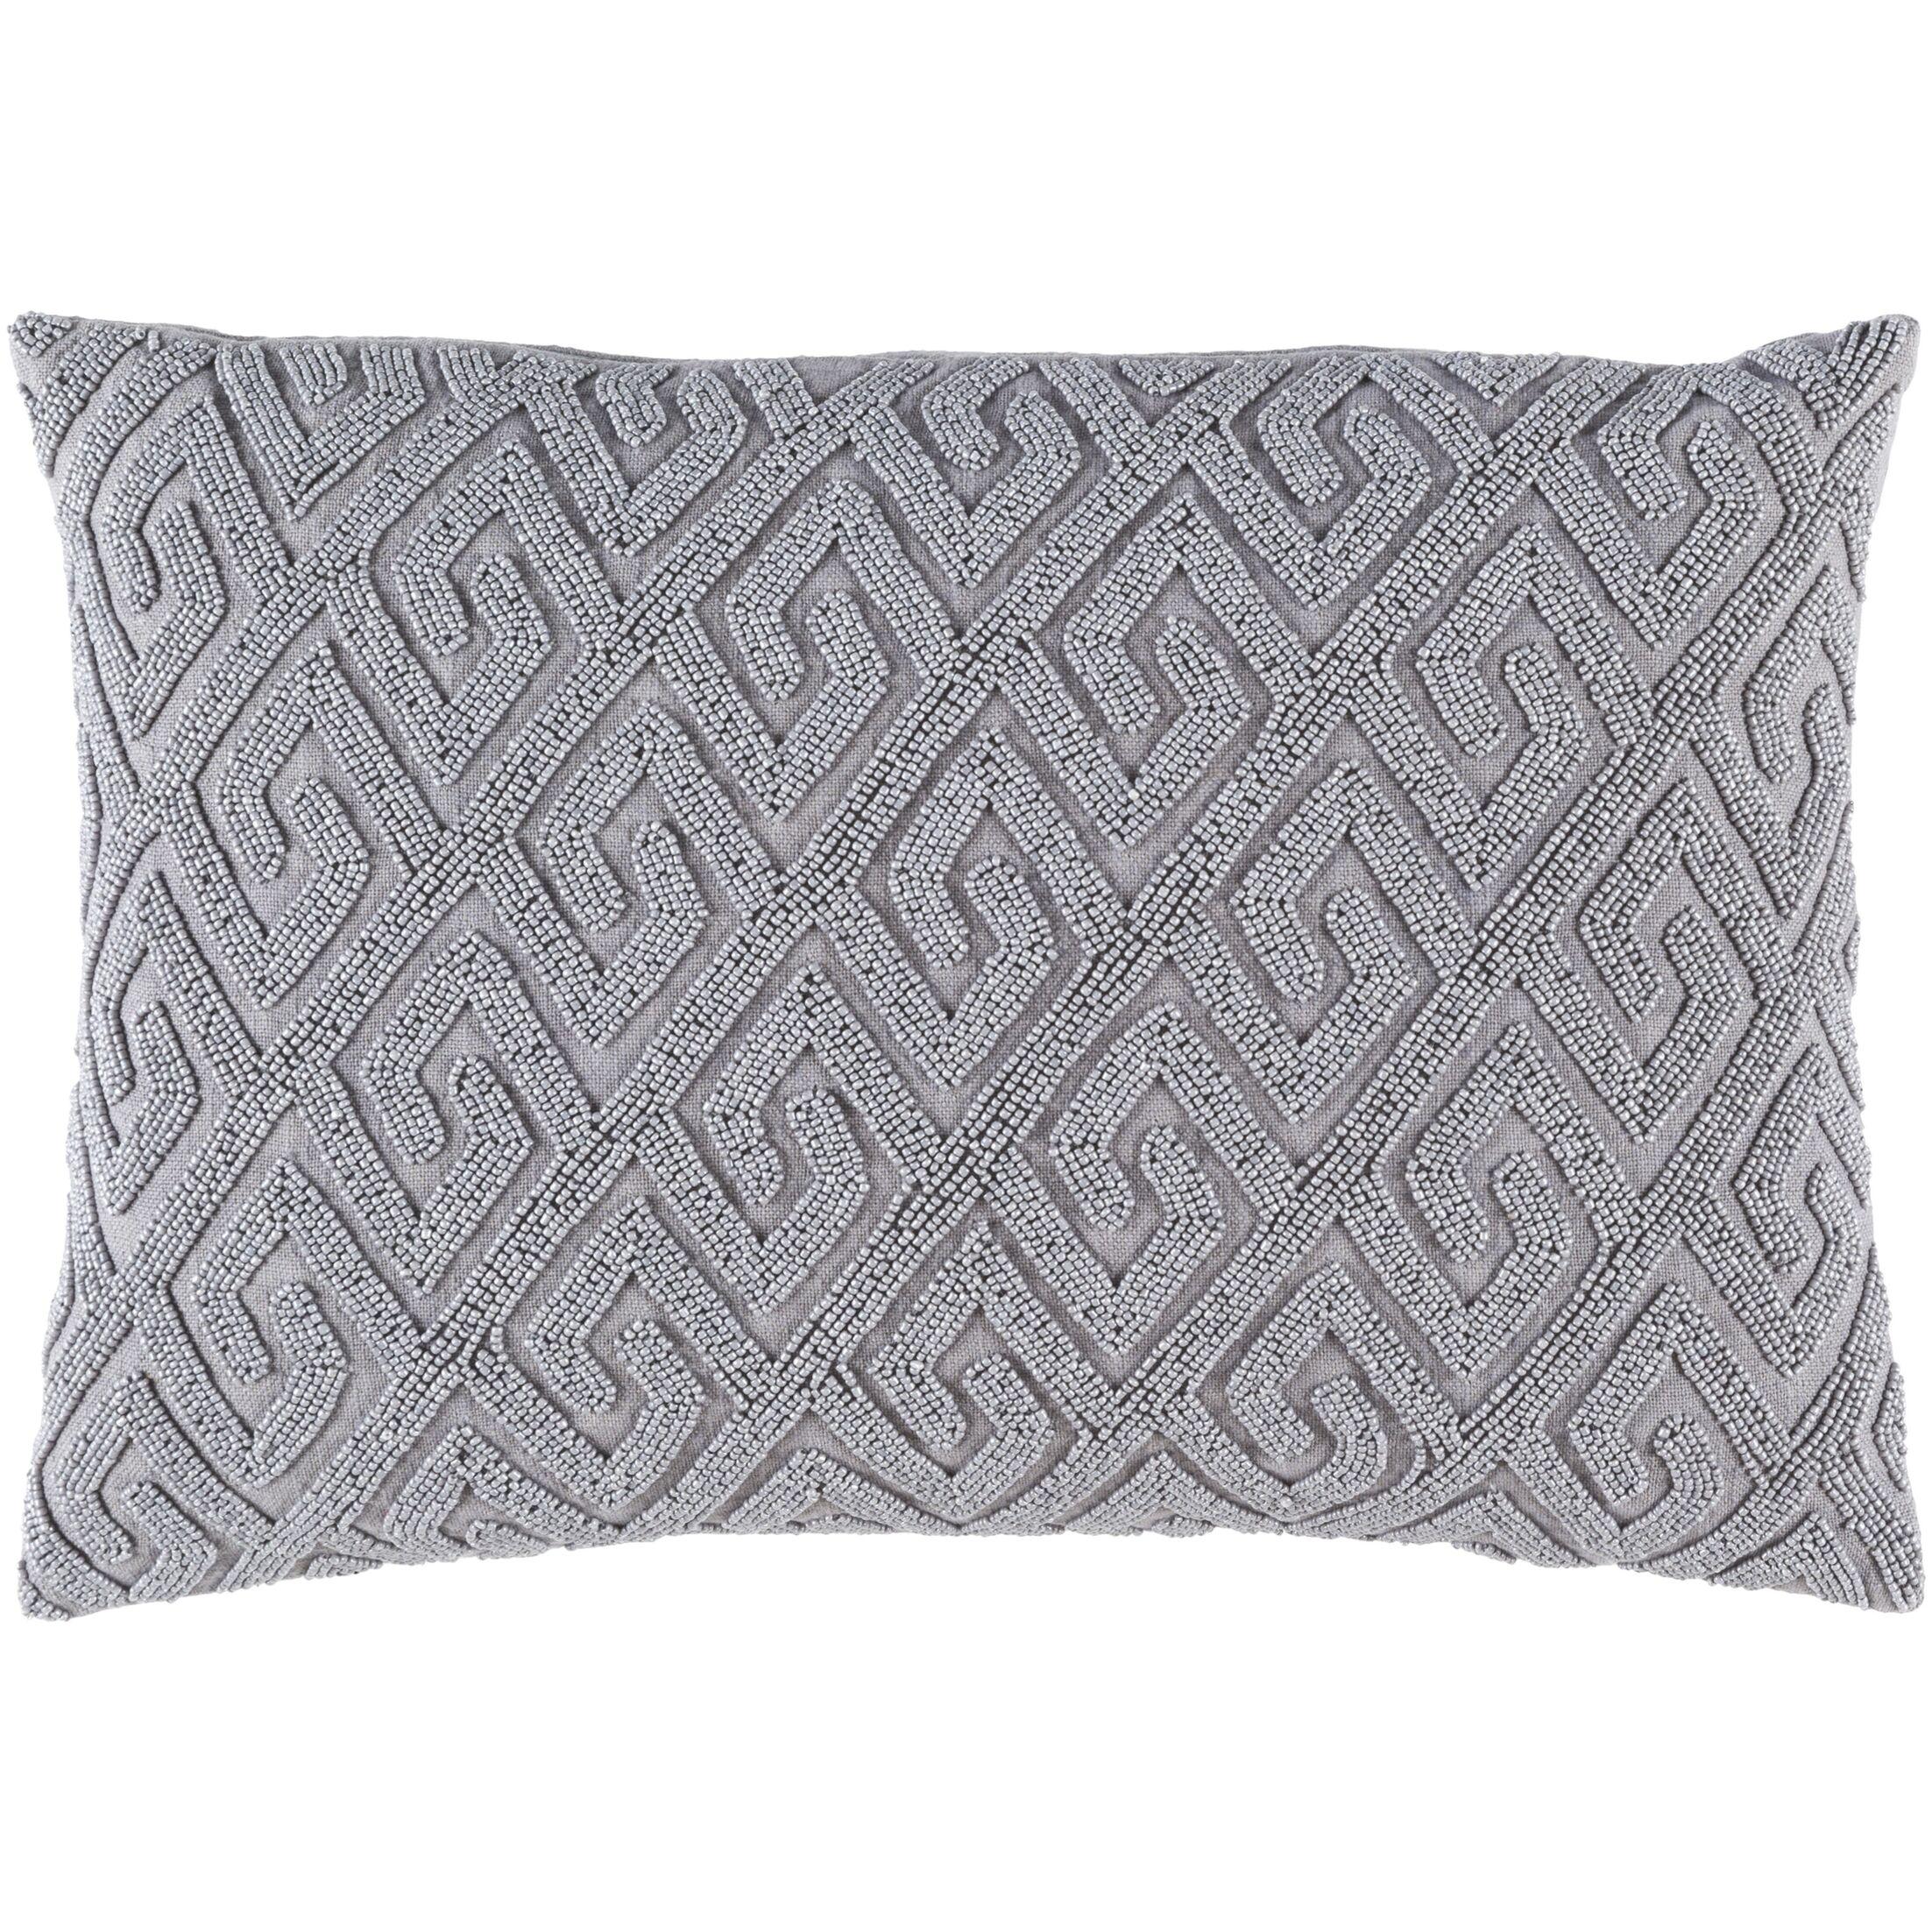 Dexter 100% Cotton Lumbar Pillow Cover Color: Gray